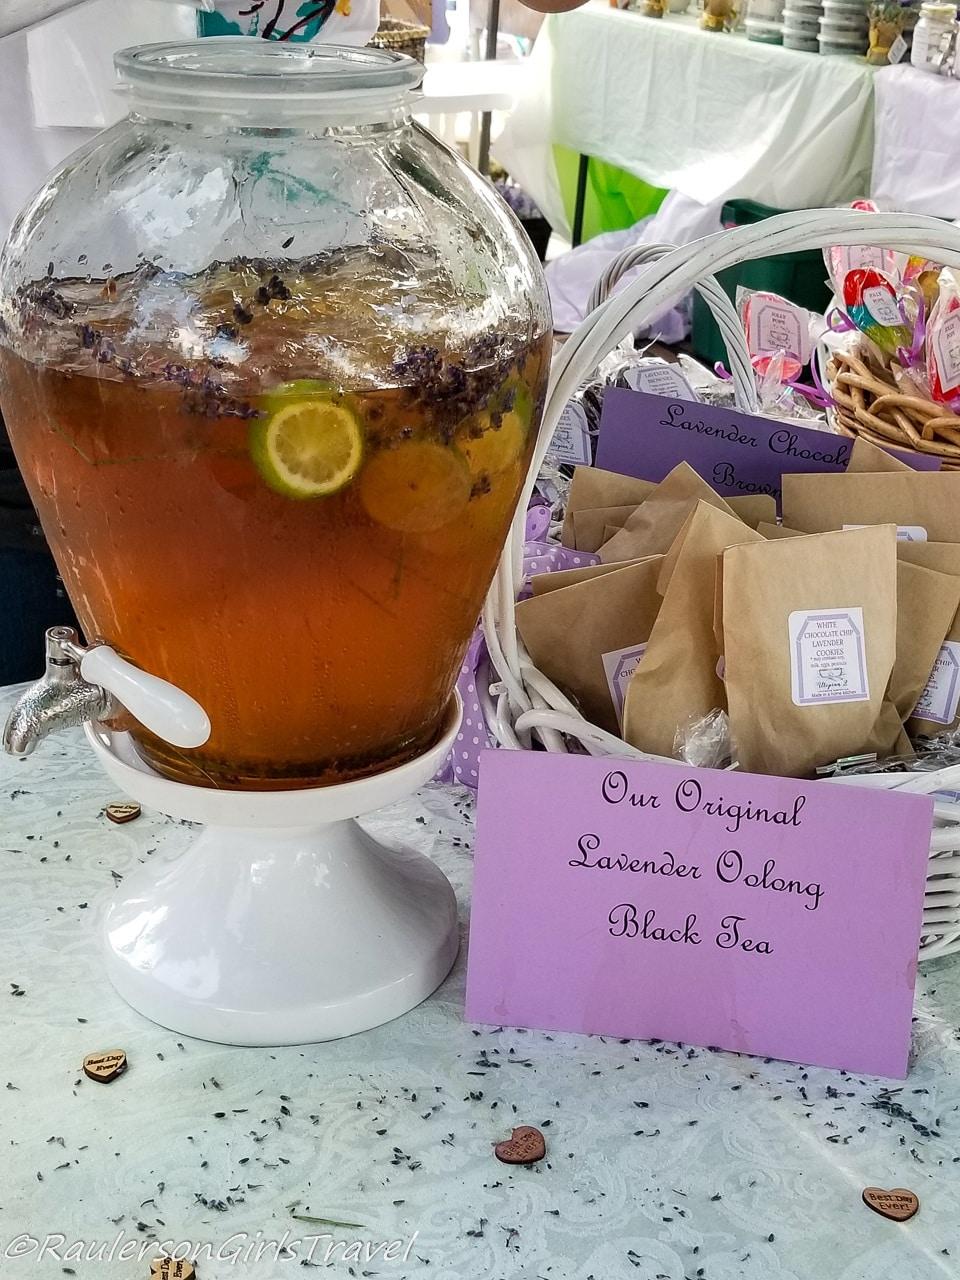 Lavender Oolong Black Tea